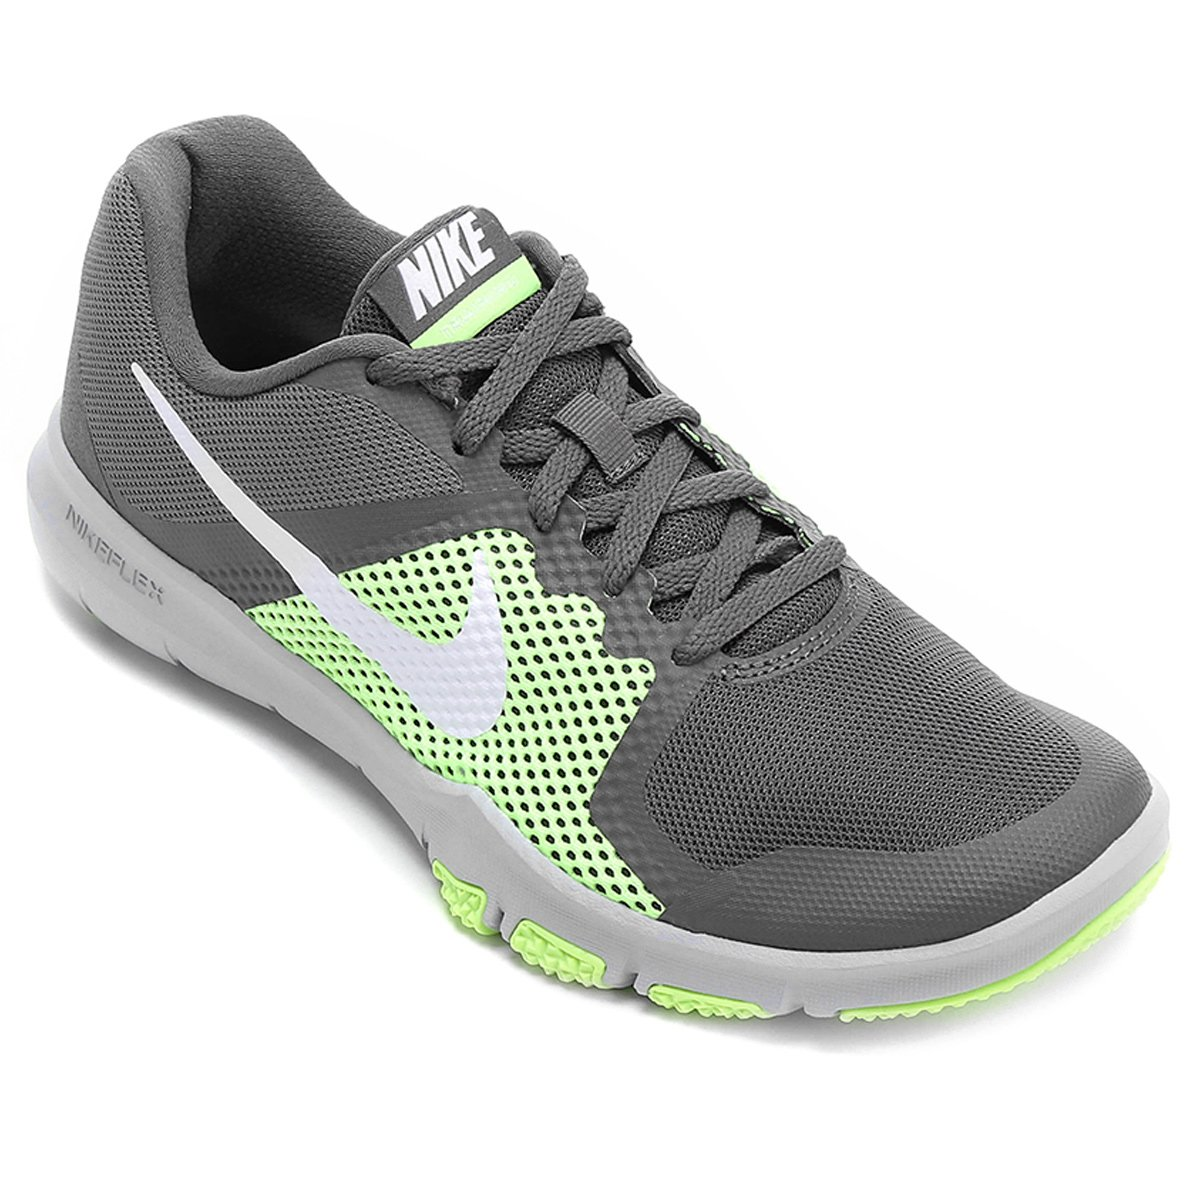 fa8263cac896c Tênis Nike Flex Control Masculino   Loja do Inter